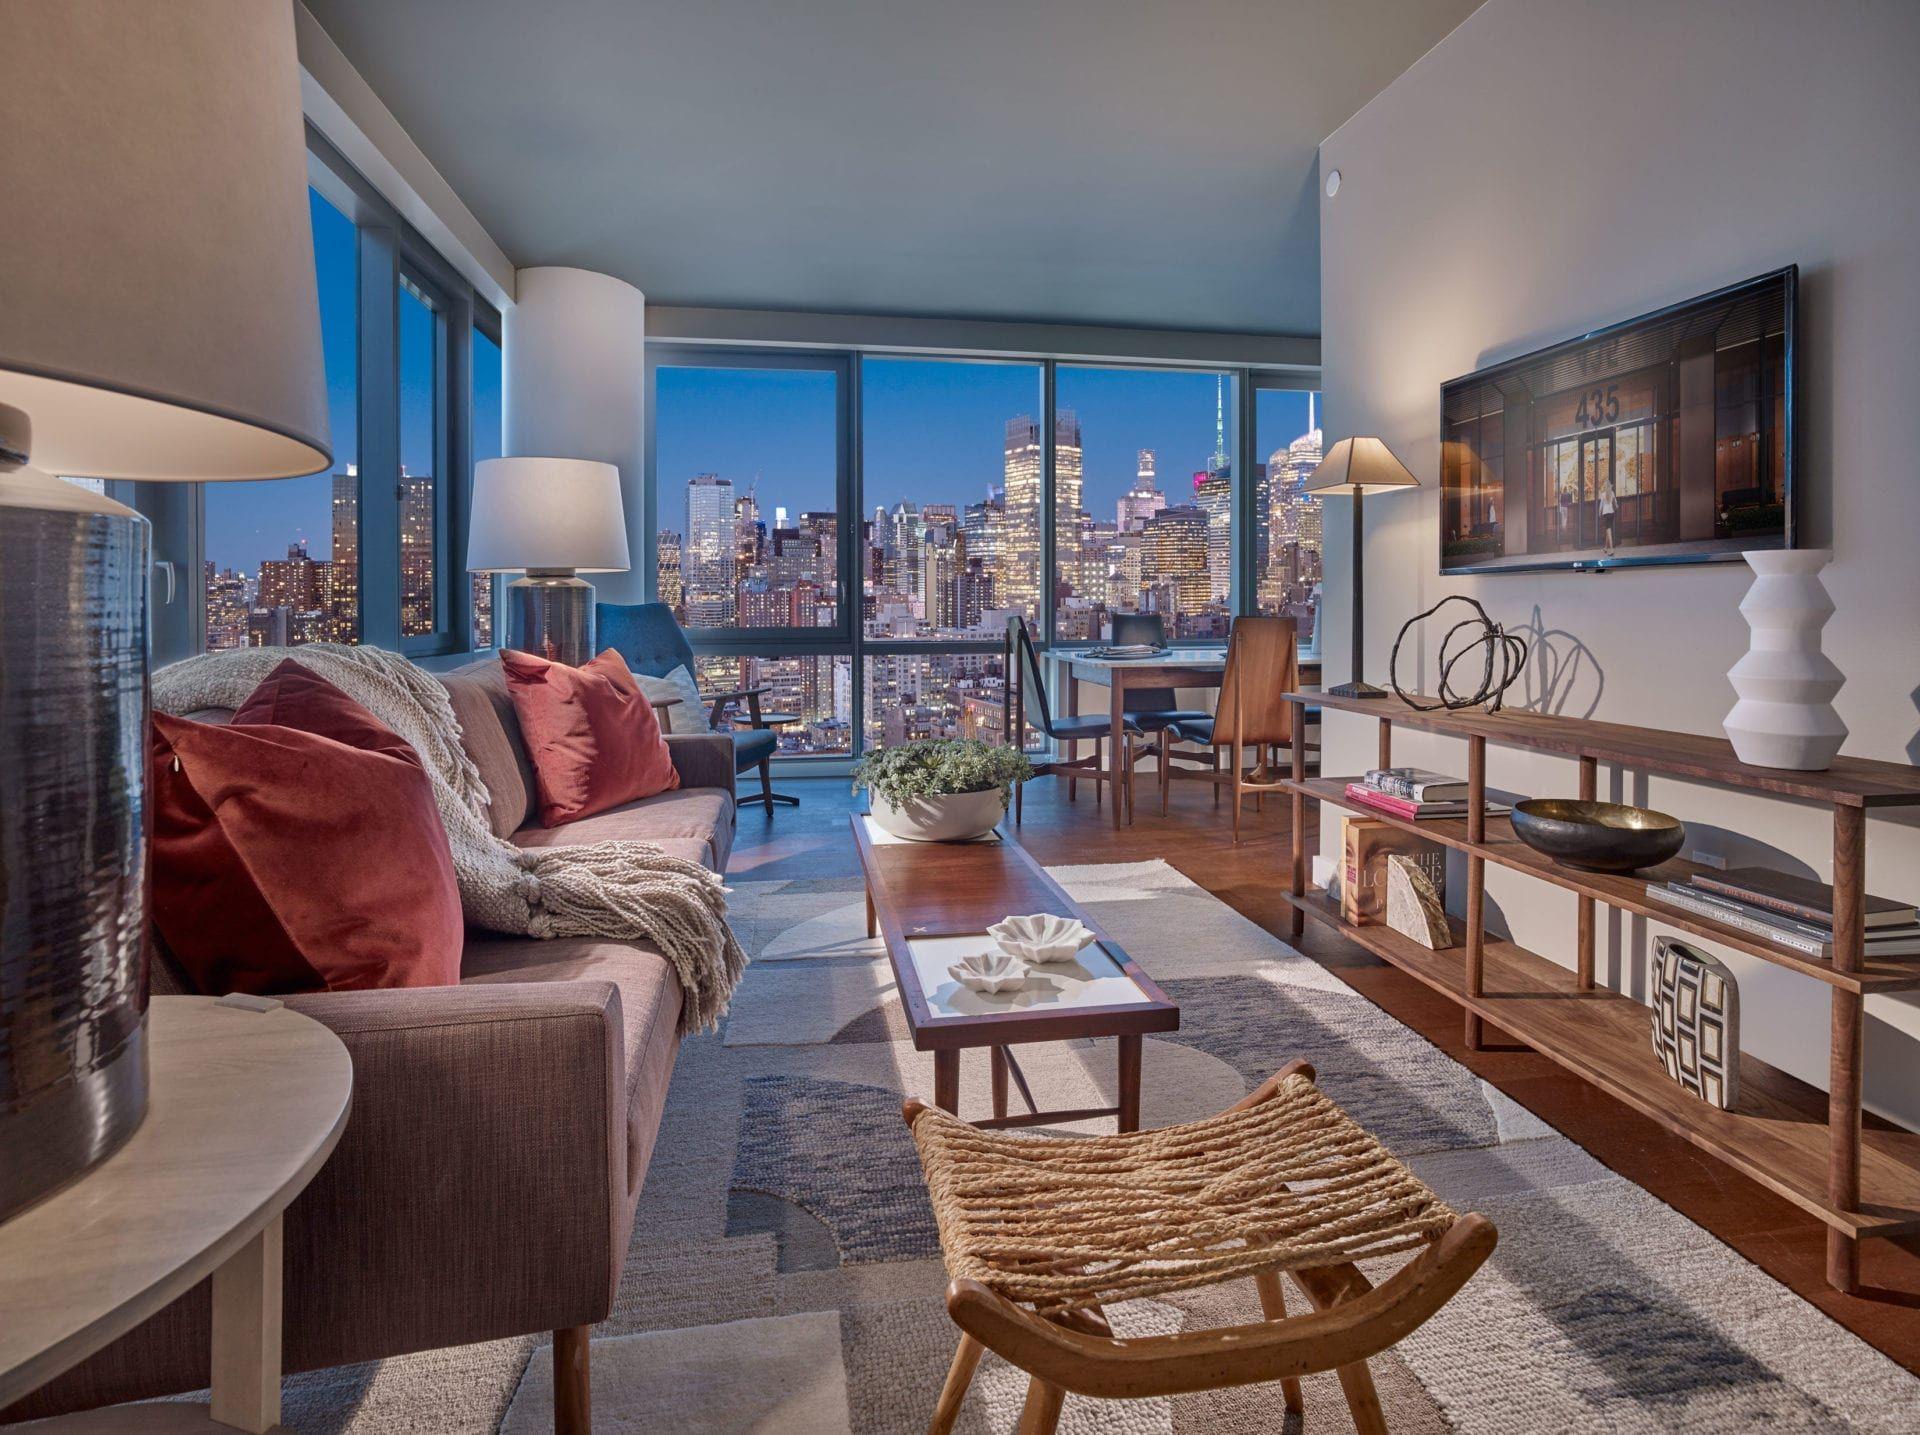 Midtown Manhattan Luxury Apartments For Rent The Eugene Nyc Apartment Luxury New York City Apartment New York Apartments